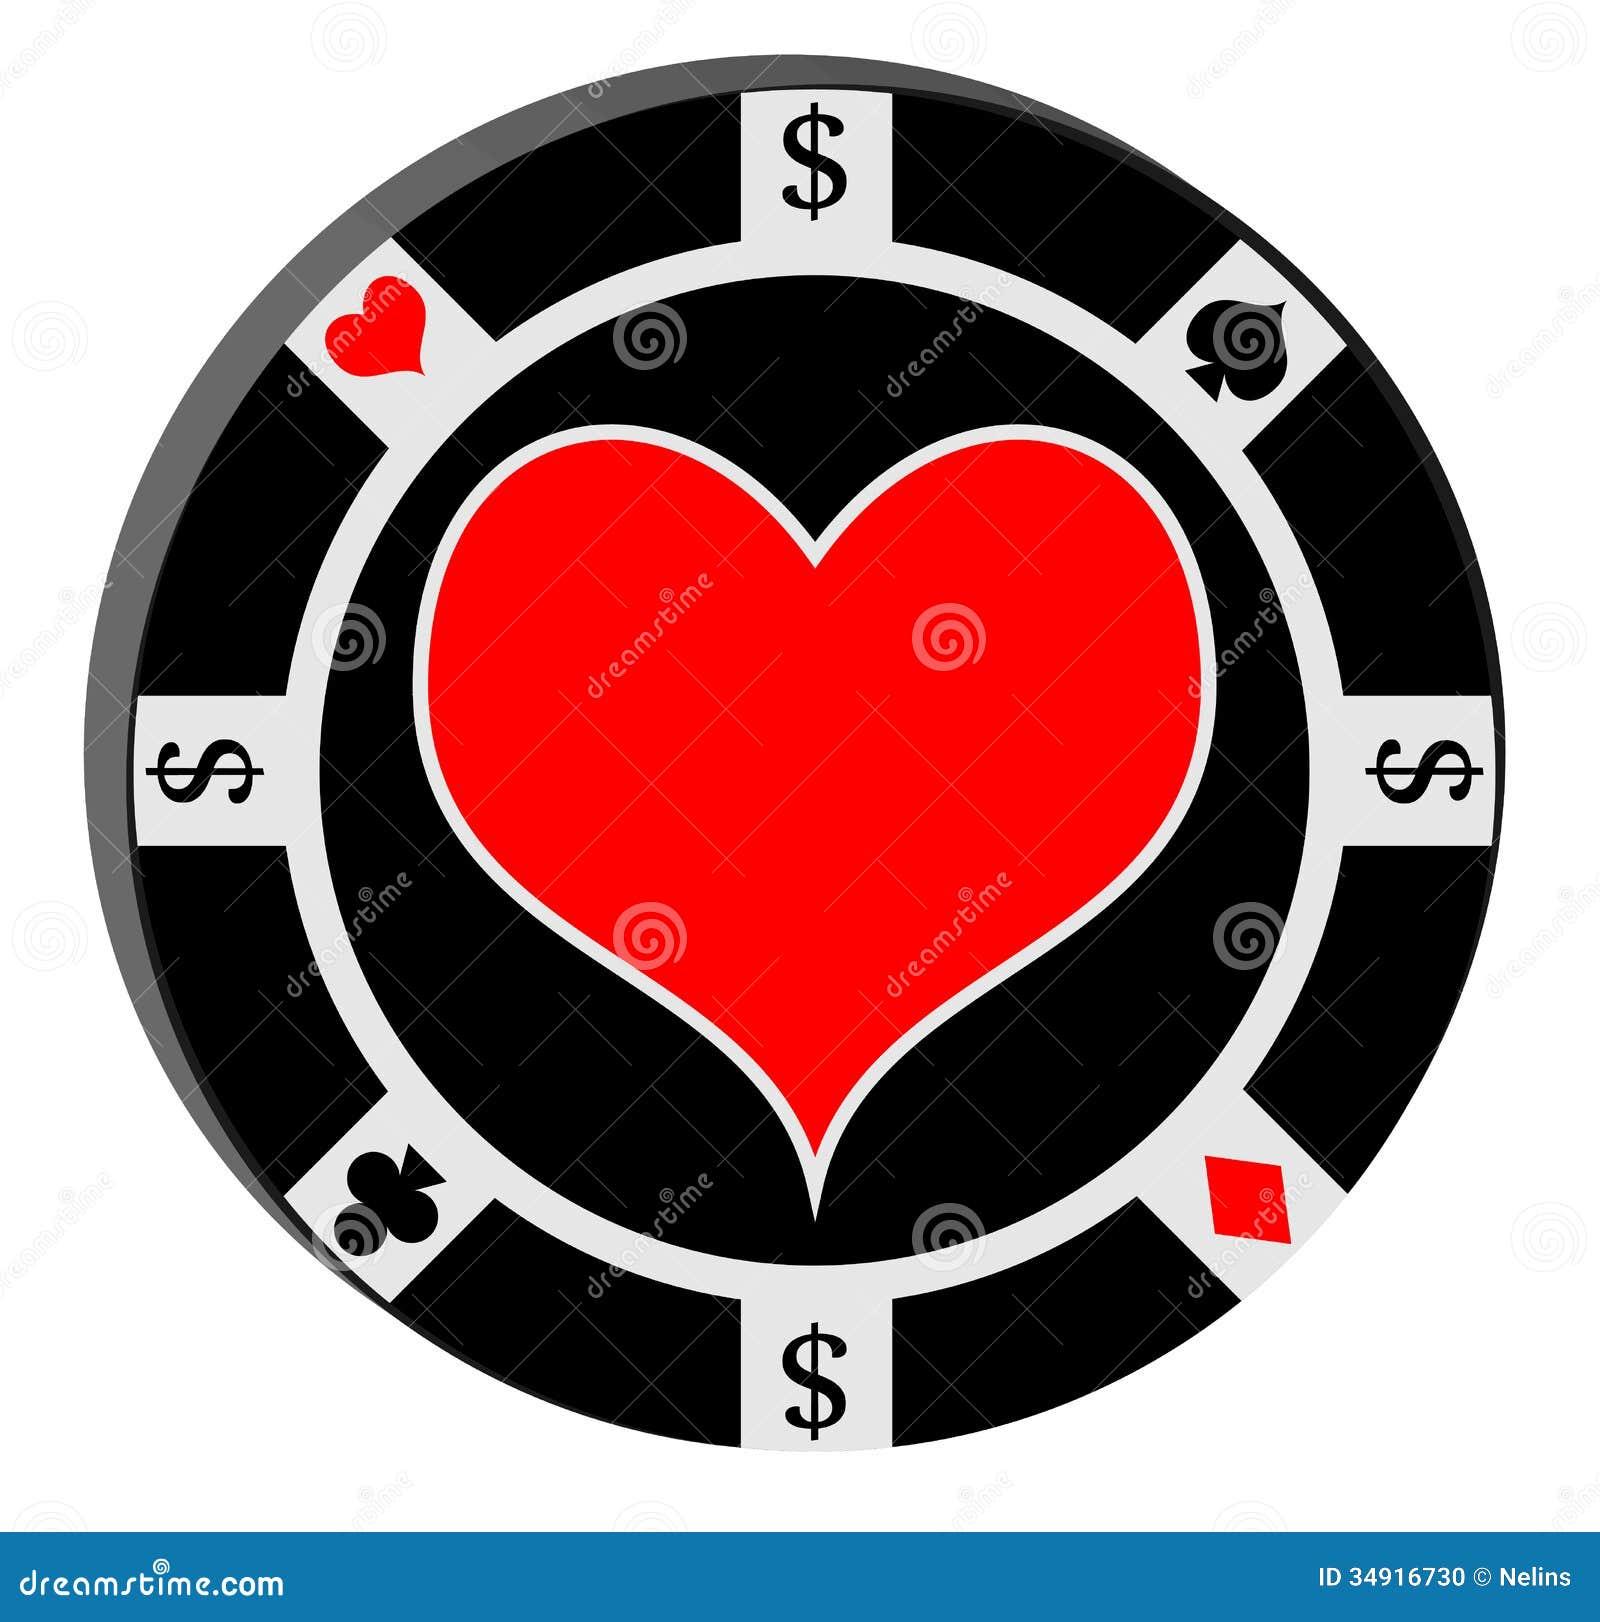 Poker chip with heart stock illustration. Illustration of